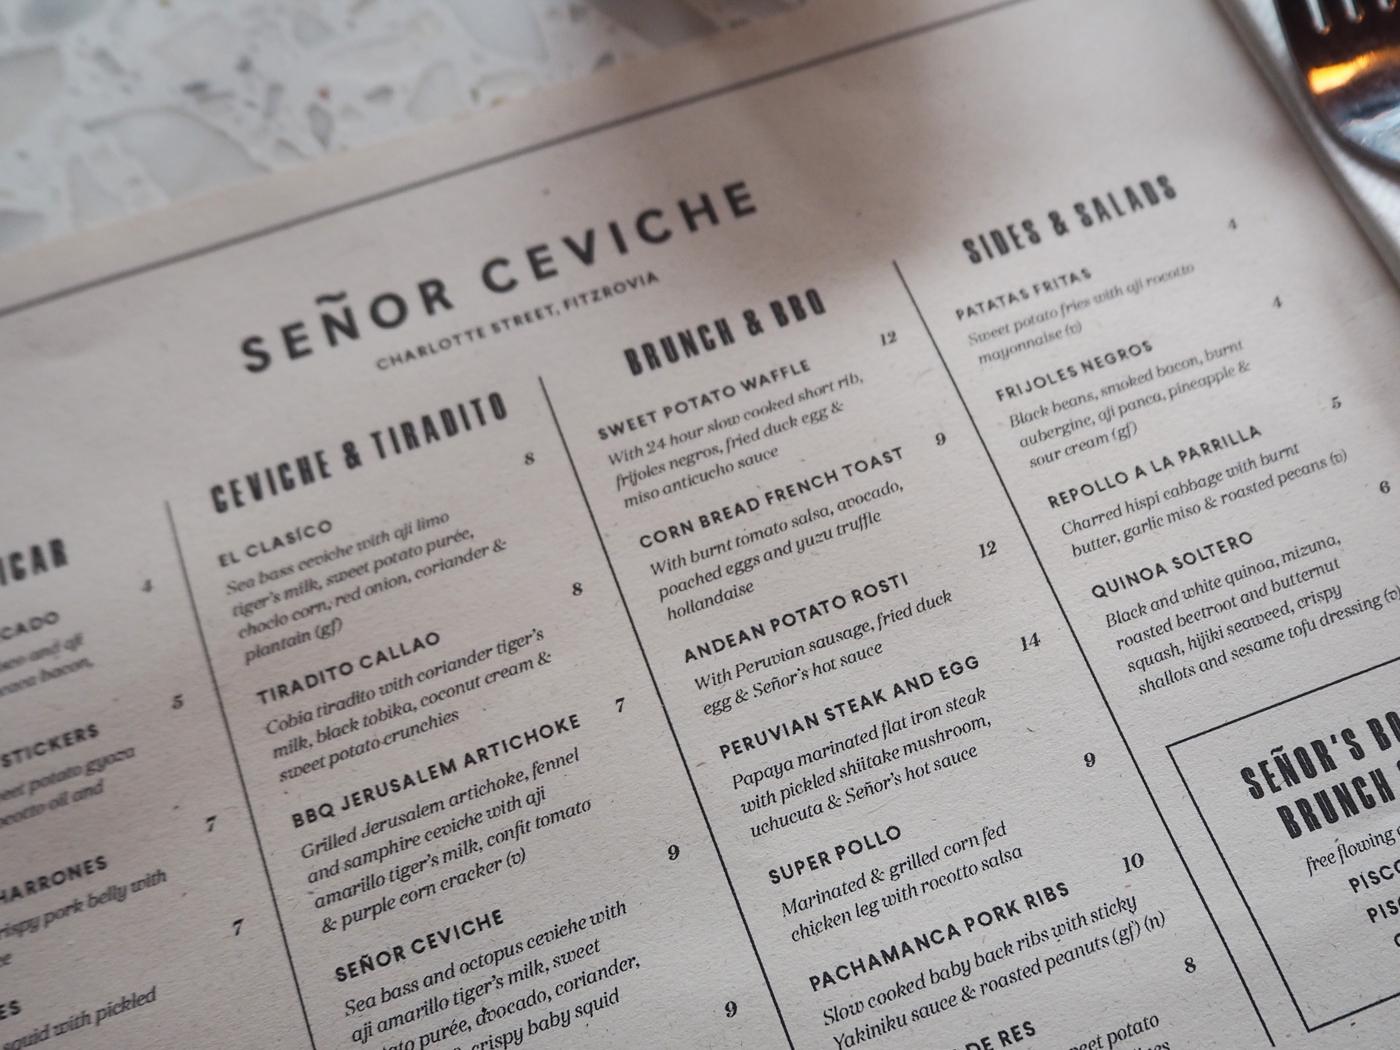 Senor Ceviche brunch menu